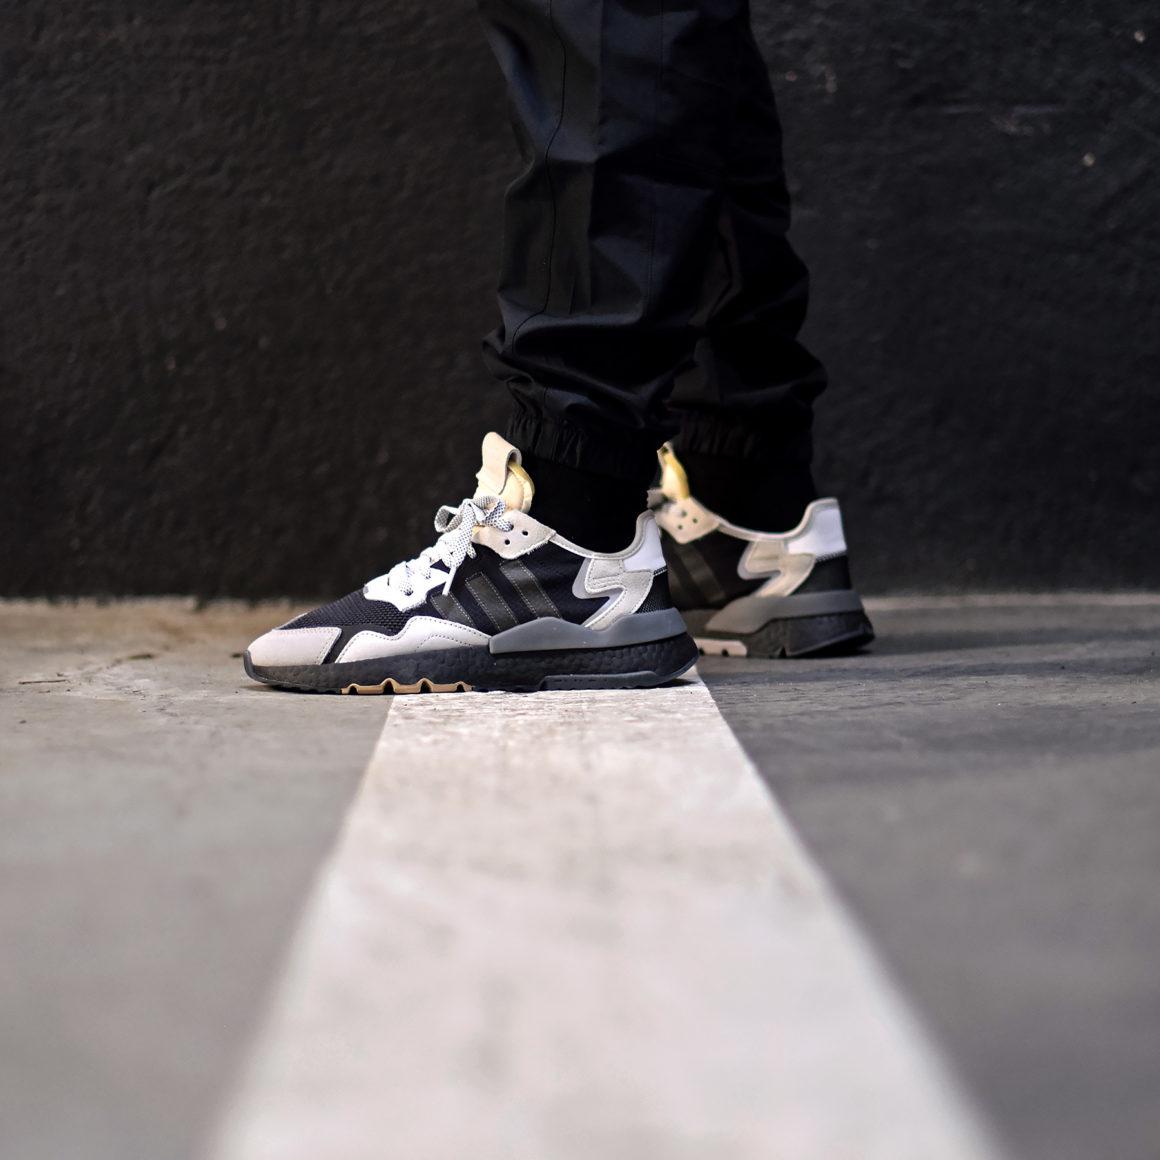 adidas-nite-jogger-black-white-11